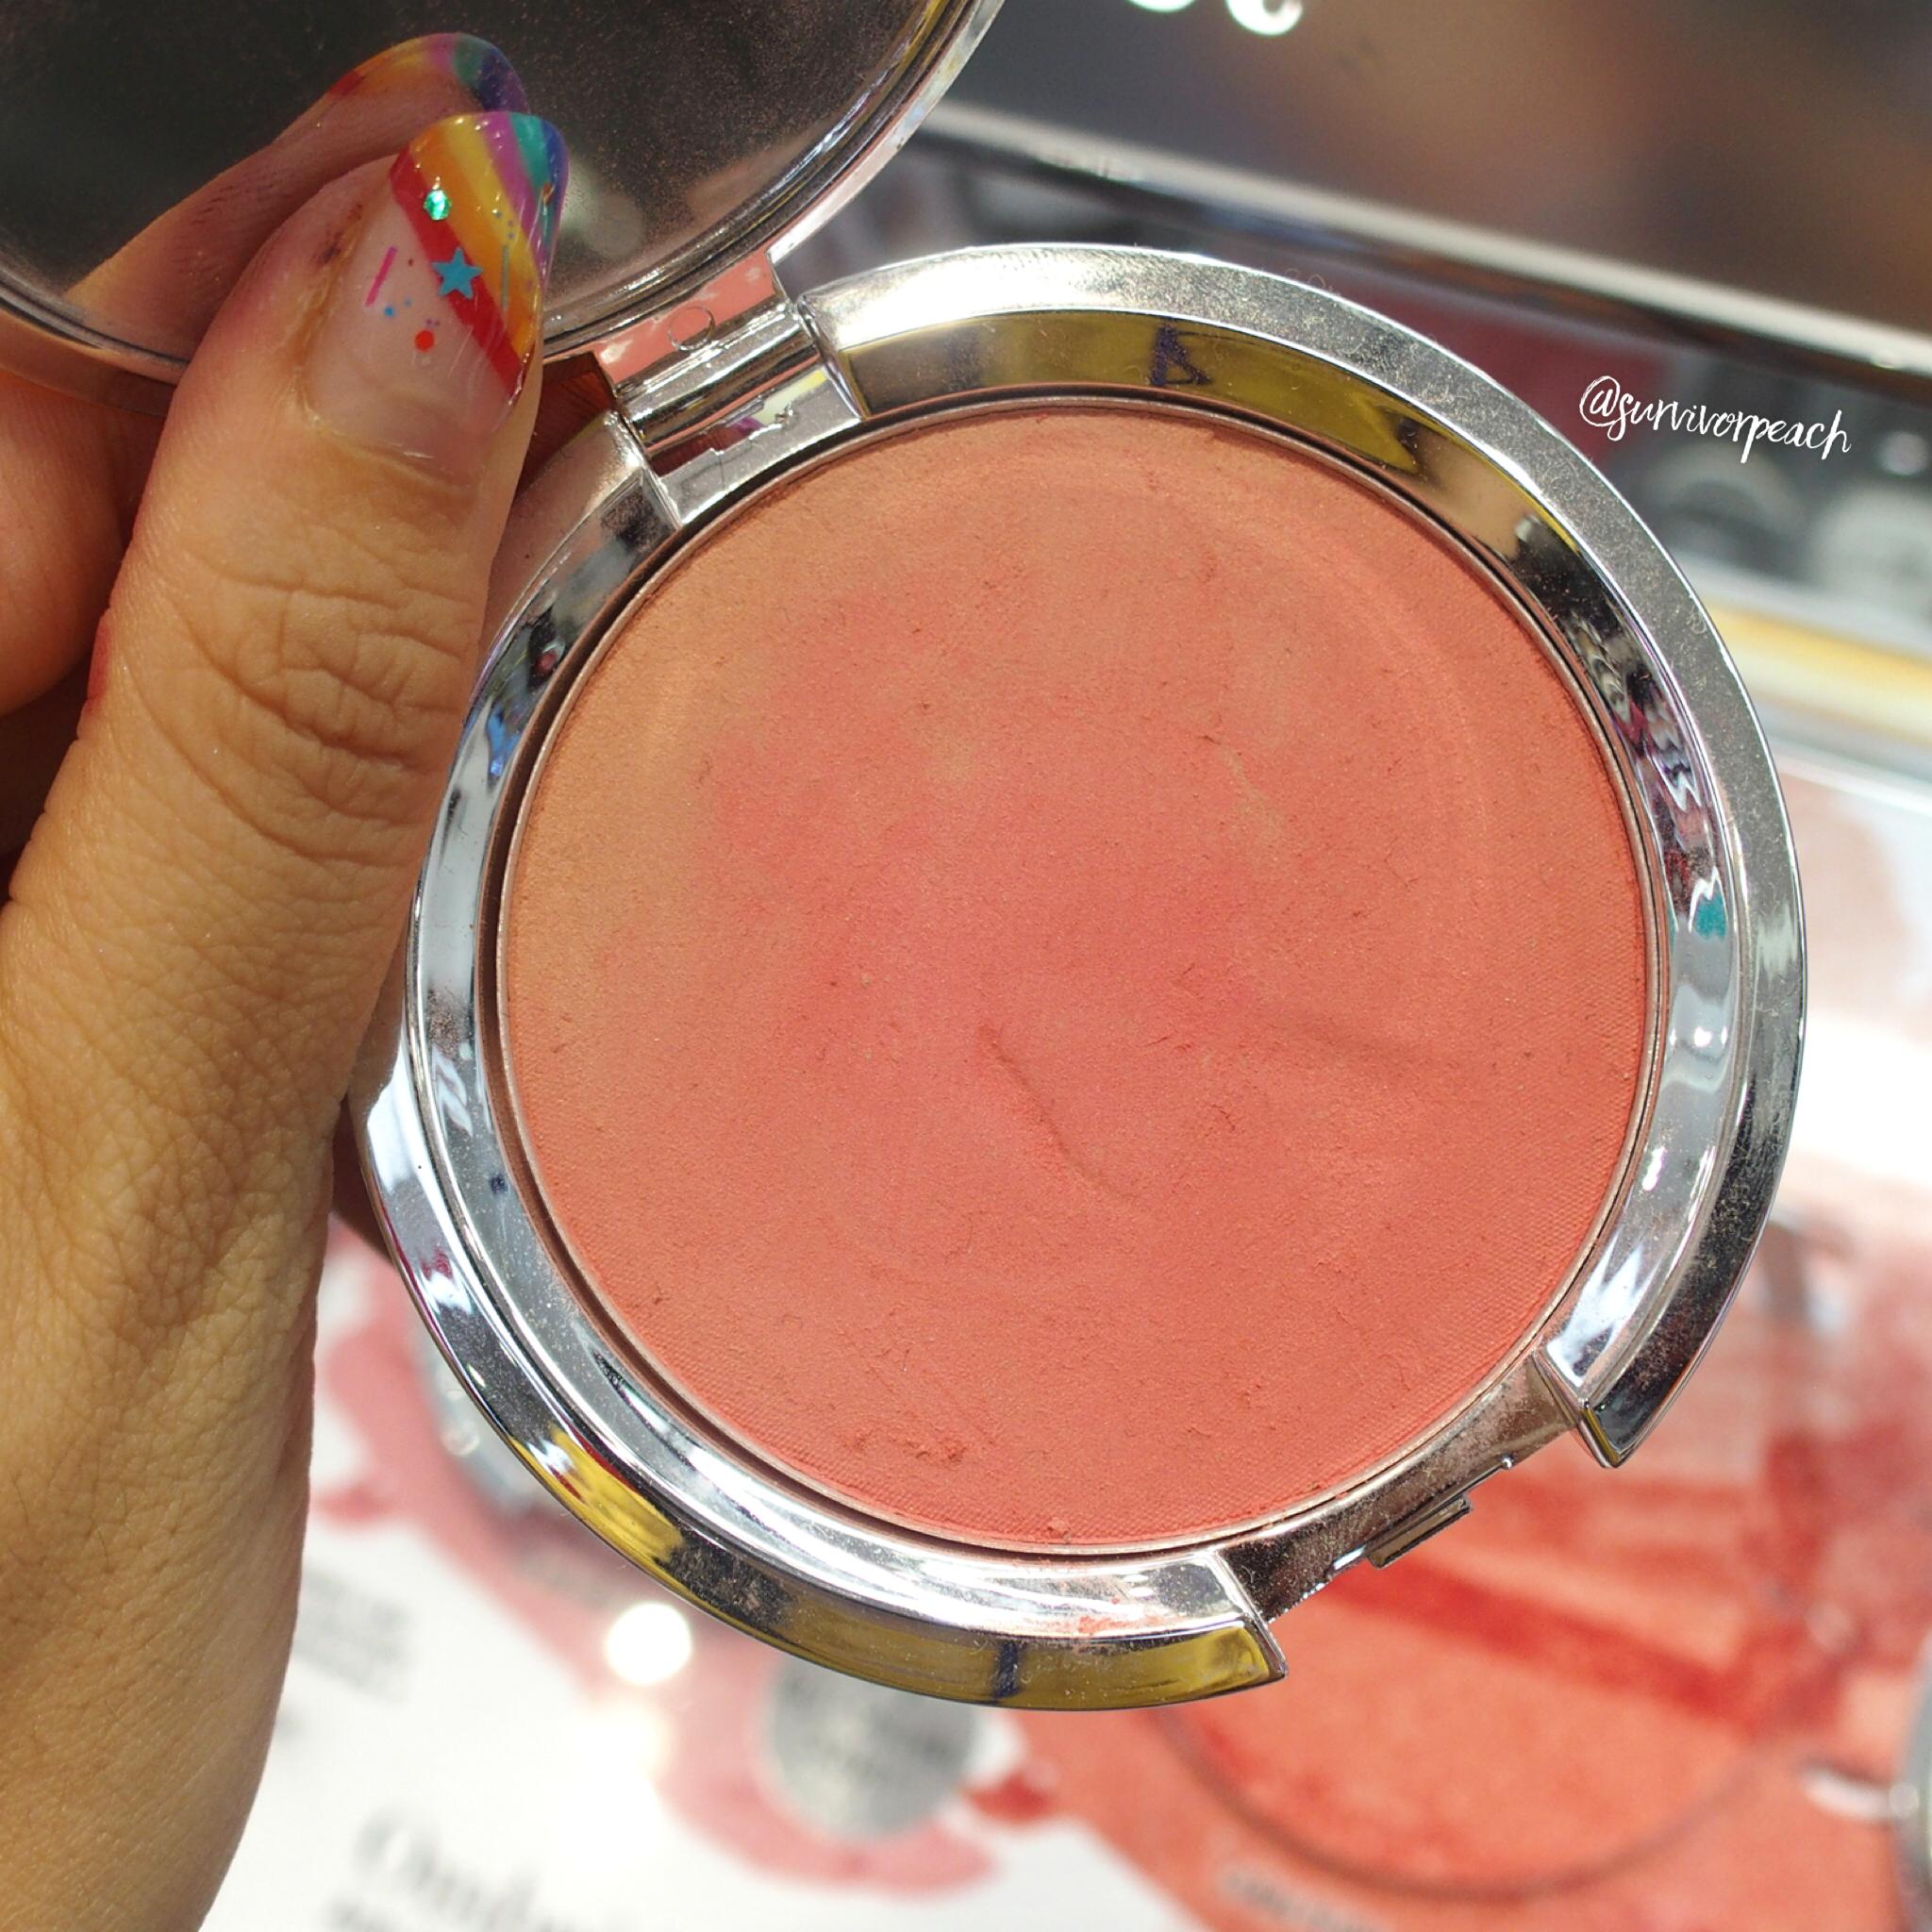 It cosmetics Ombré Radiance Blush - Coral Flush